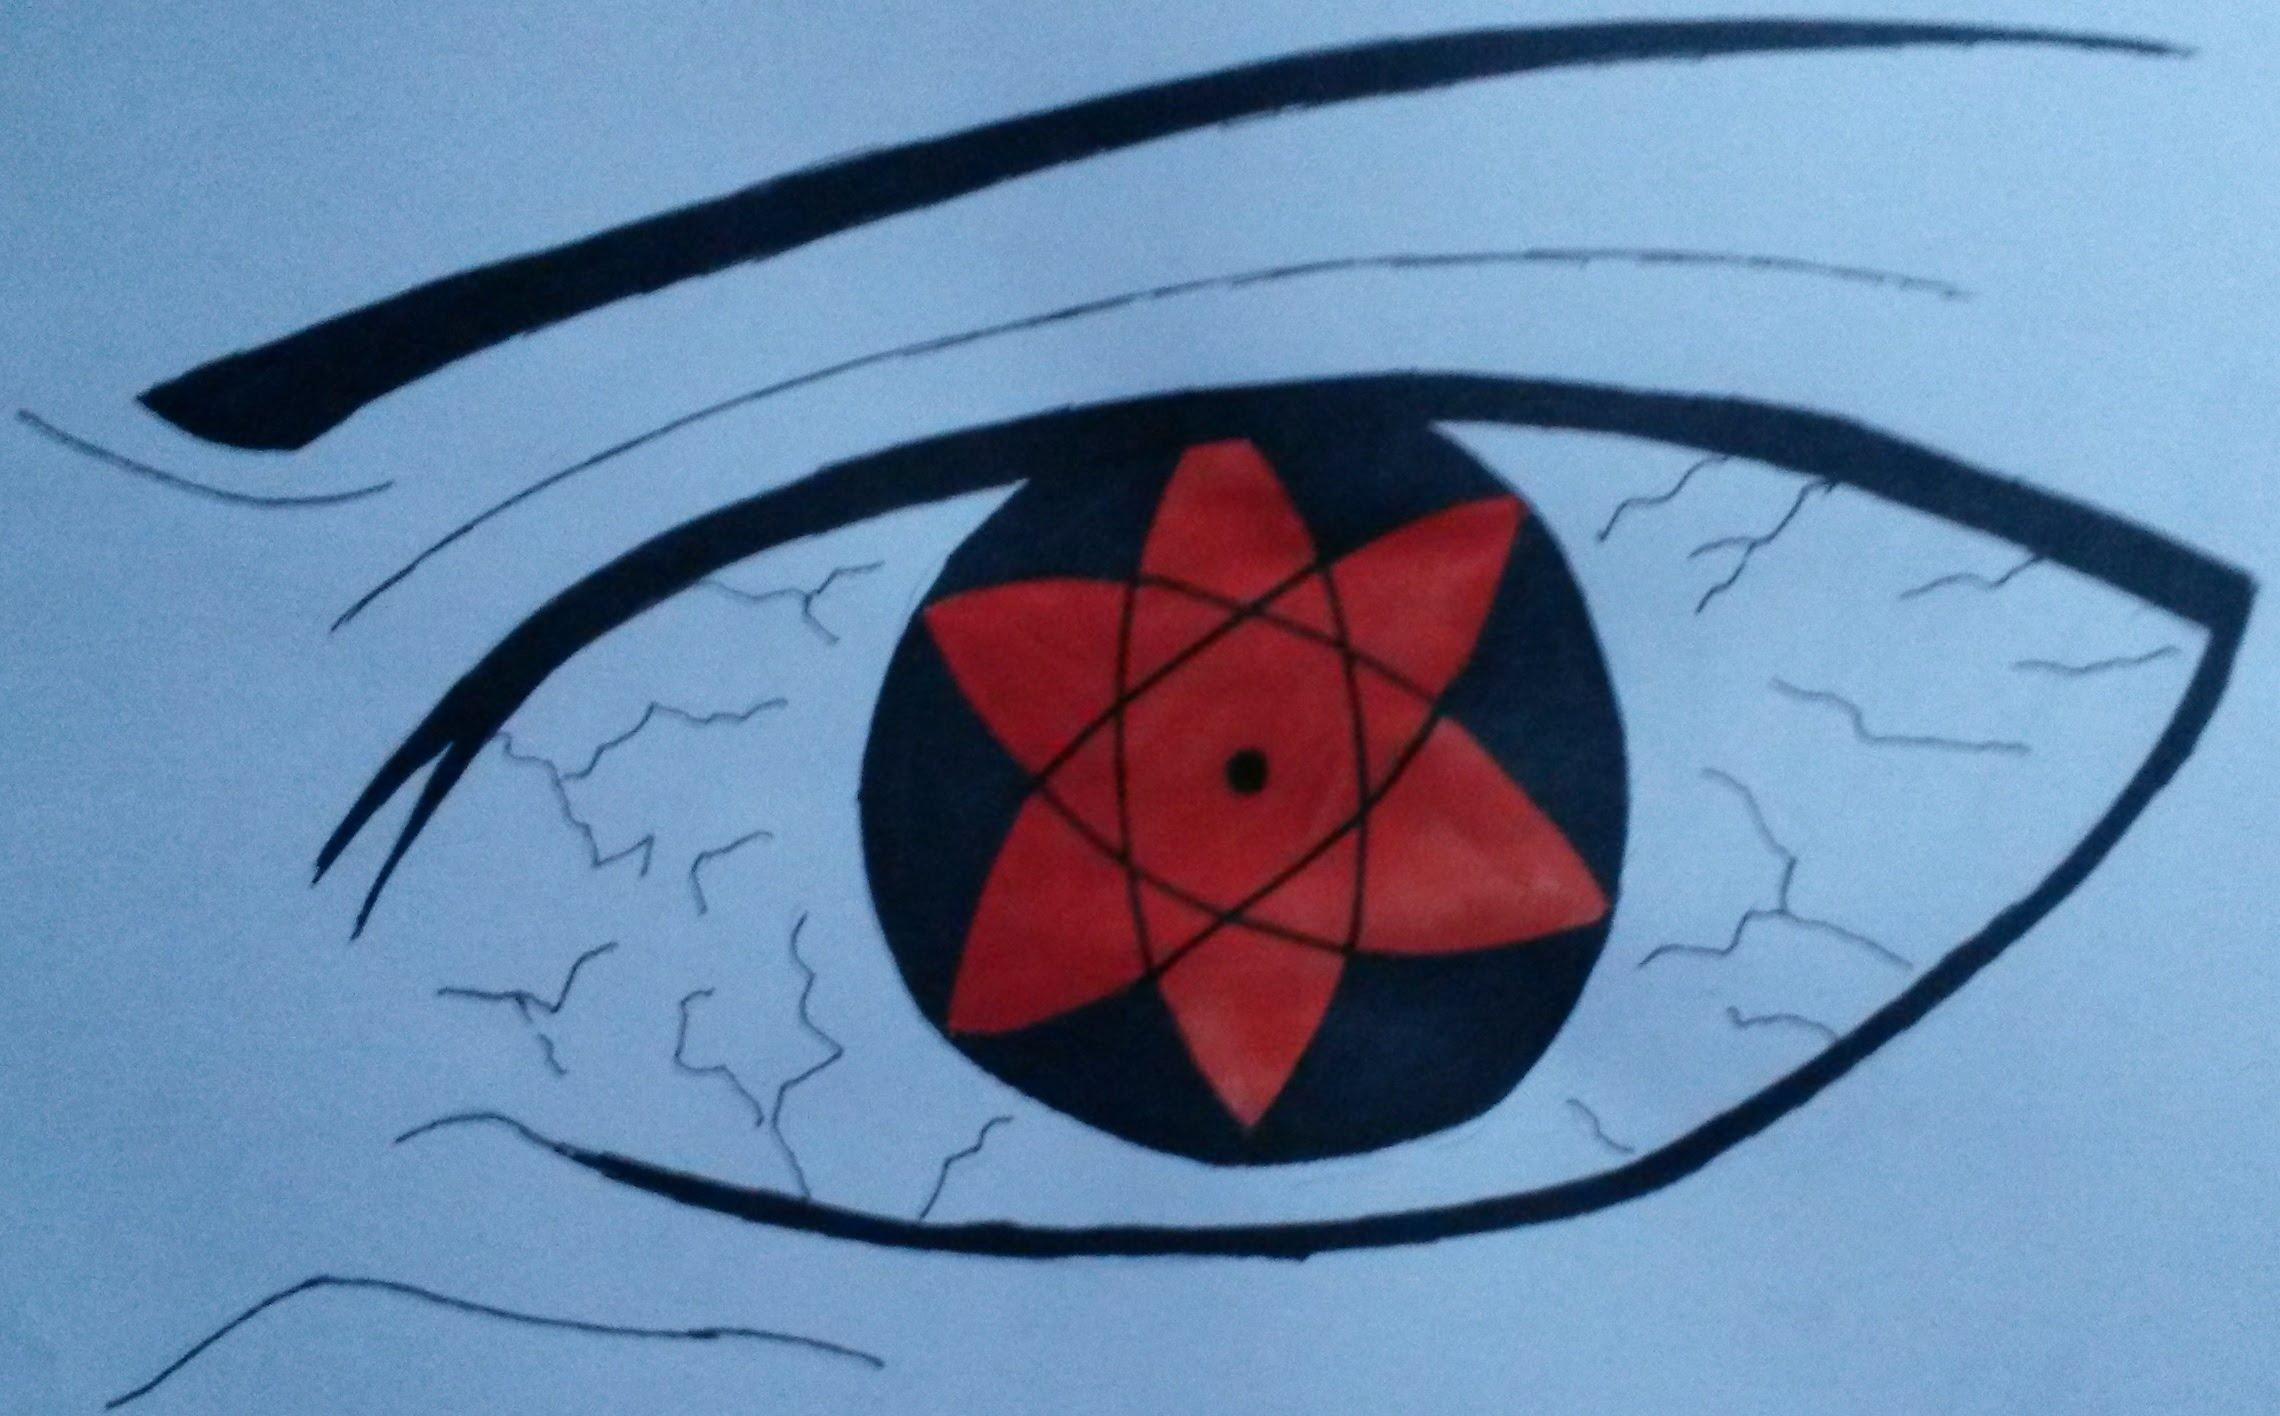 2280x1416 How To Draw Eyes Sasuke's Mangekyou Sharingan Color